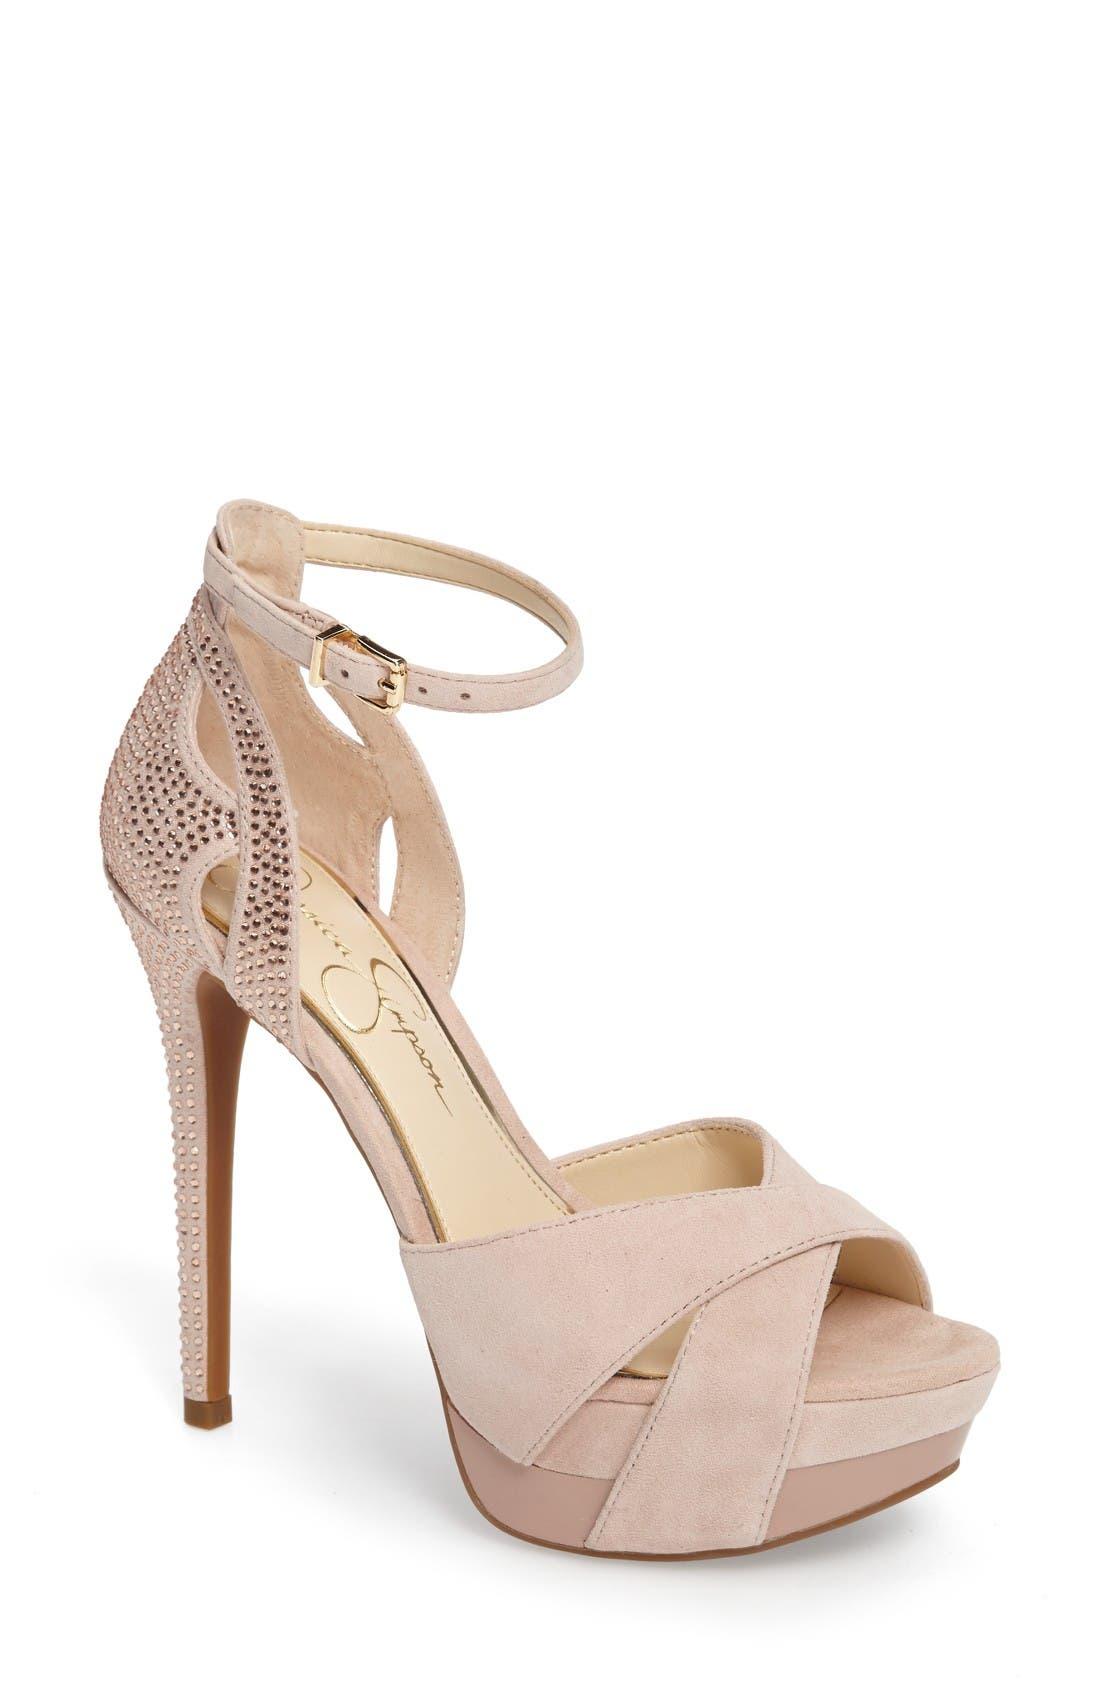 JESSICA SIMPSON Wendah Strappy Platform Sandal